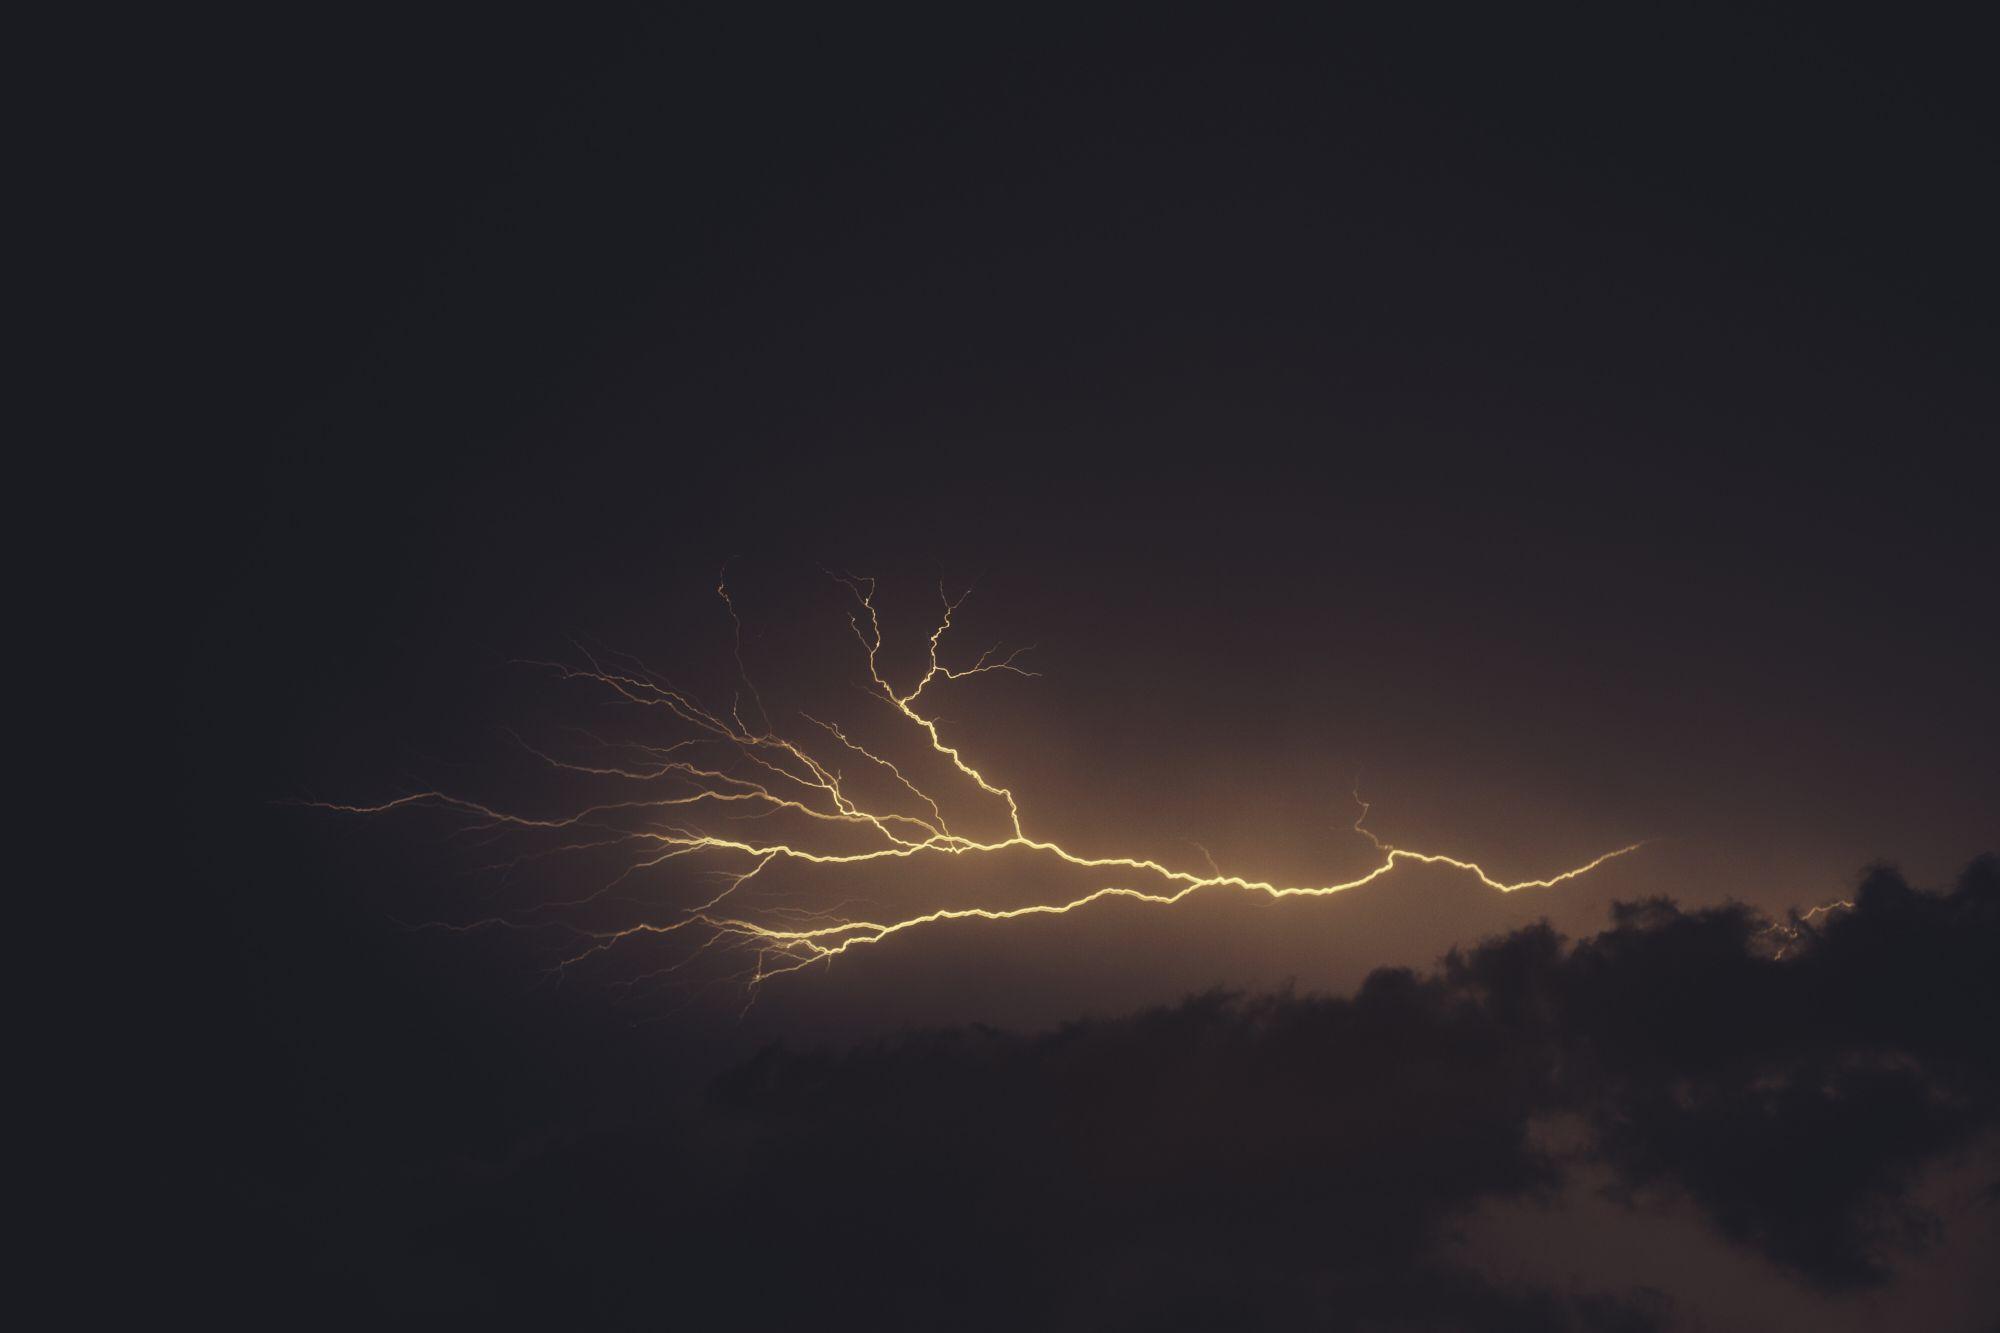 Typhoon Season Dos And Don'ts: How To Stay Safe This Rainy Season